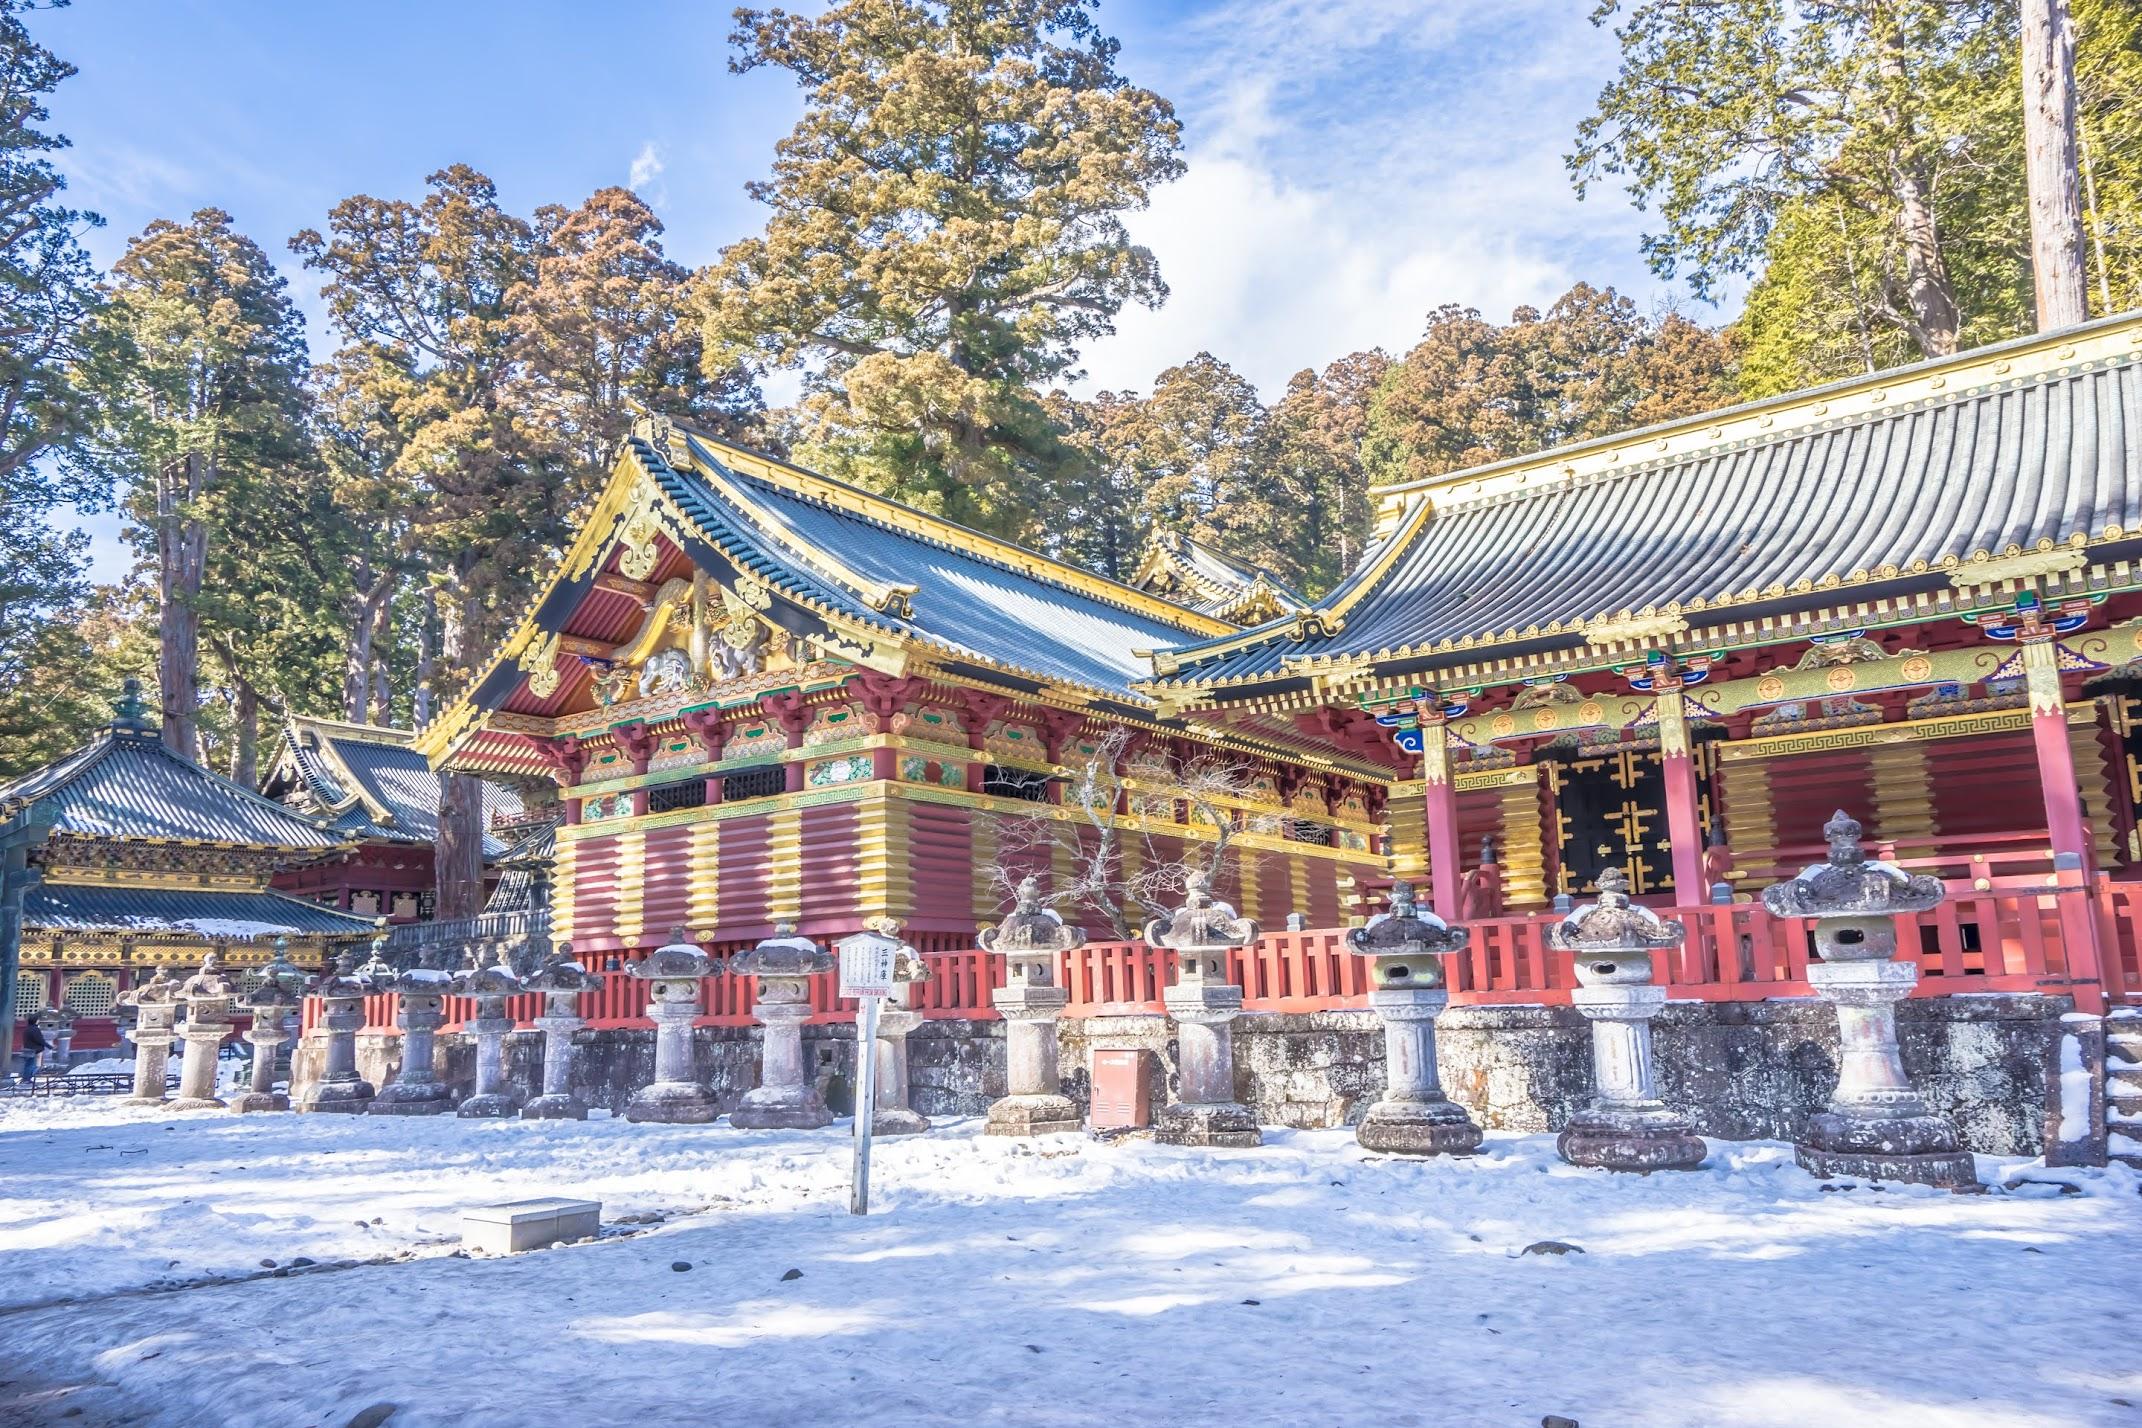 Nikko Toshogu Shrine Three Sacred Storehouses3